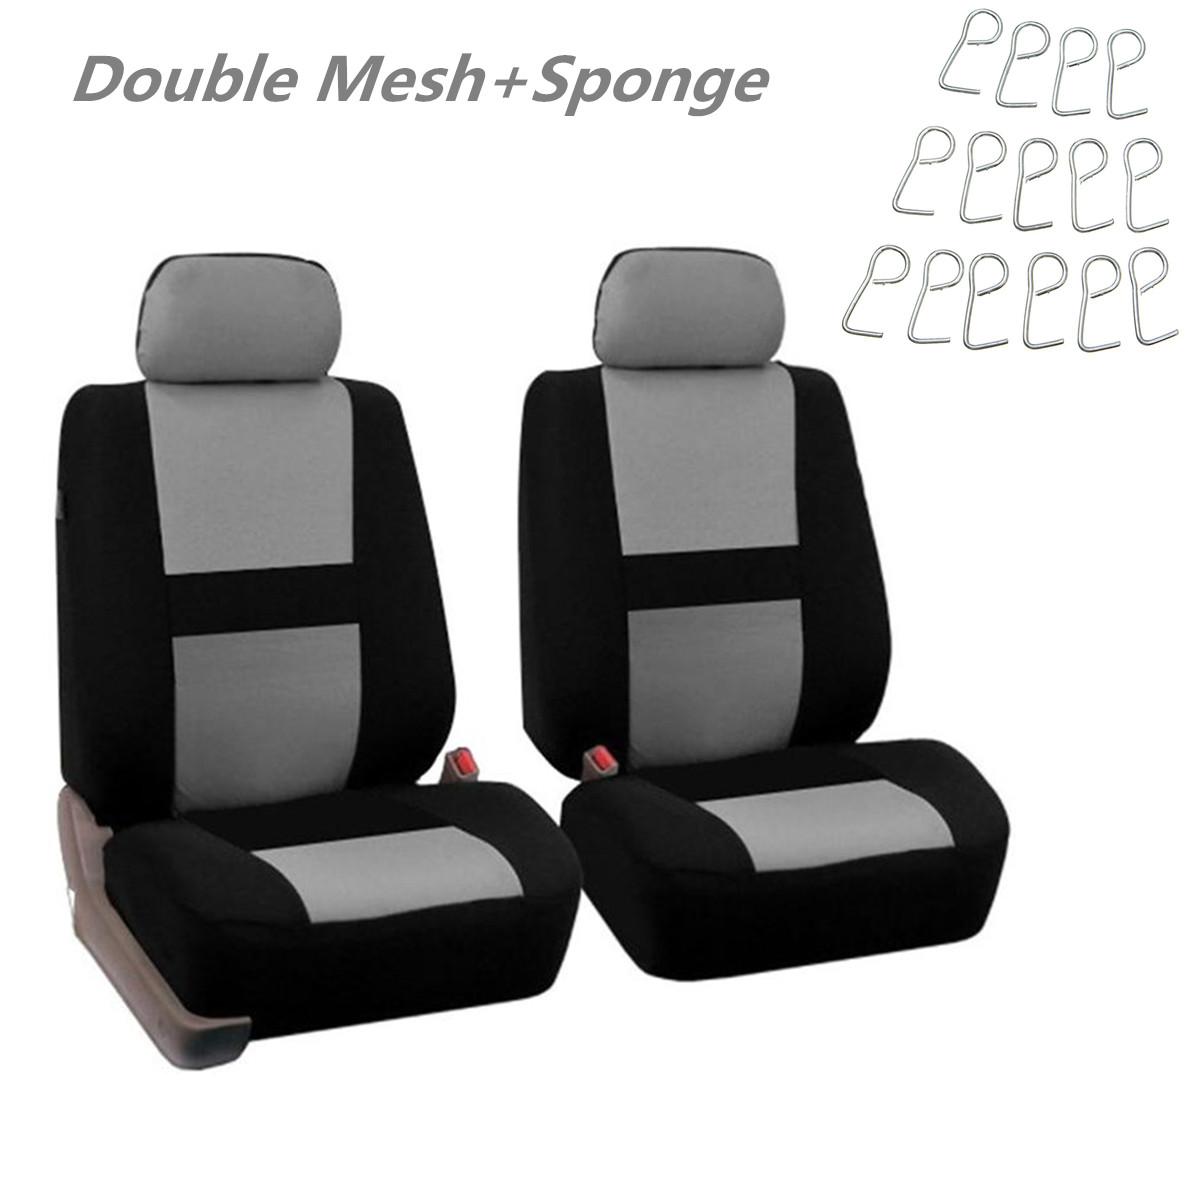 Premium Seat Cover for Sea-Doo Spark 2014-2018 3 Passenger 3 UP GRAY BLACK